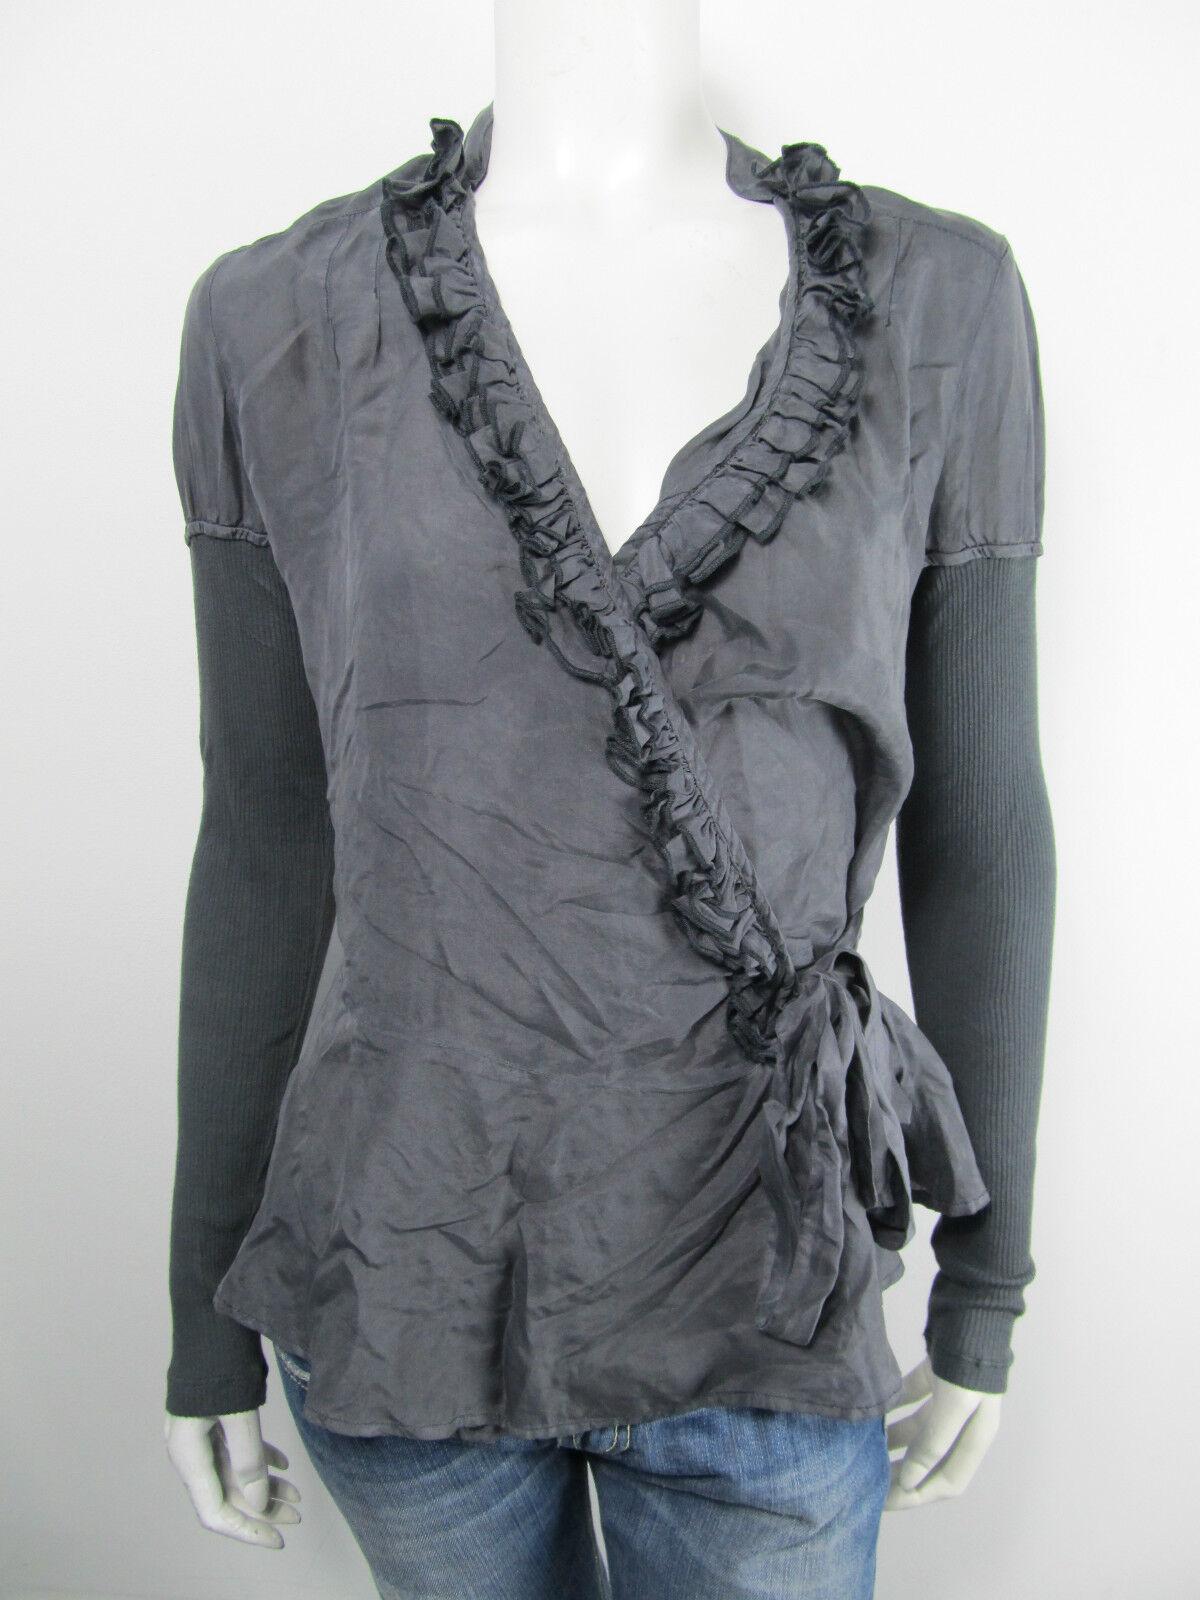 Guess bluese Bloes W14H01 Top Shirt Seide Neu grey XS S L